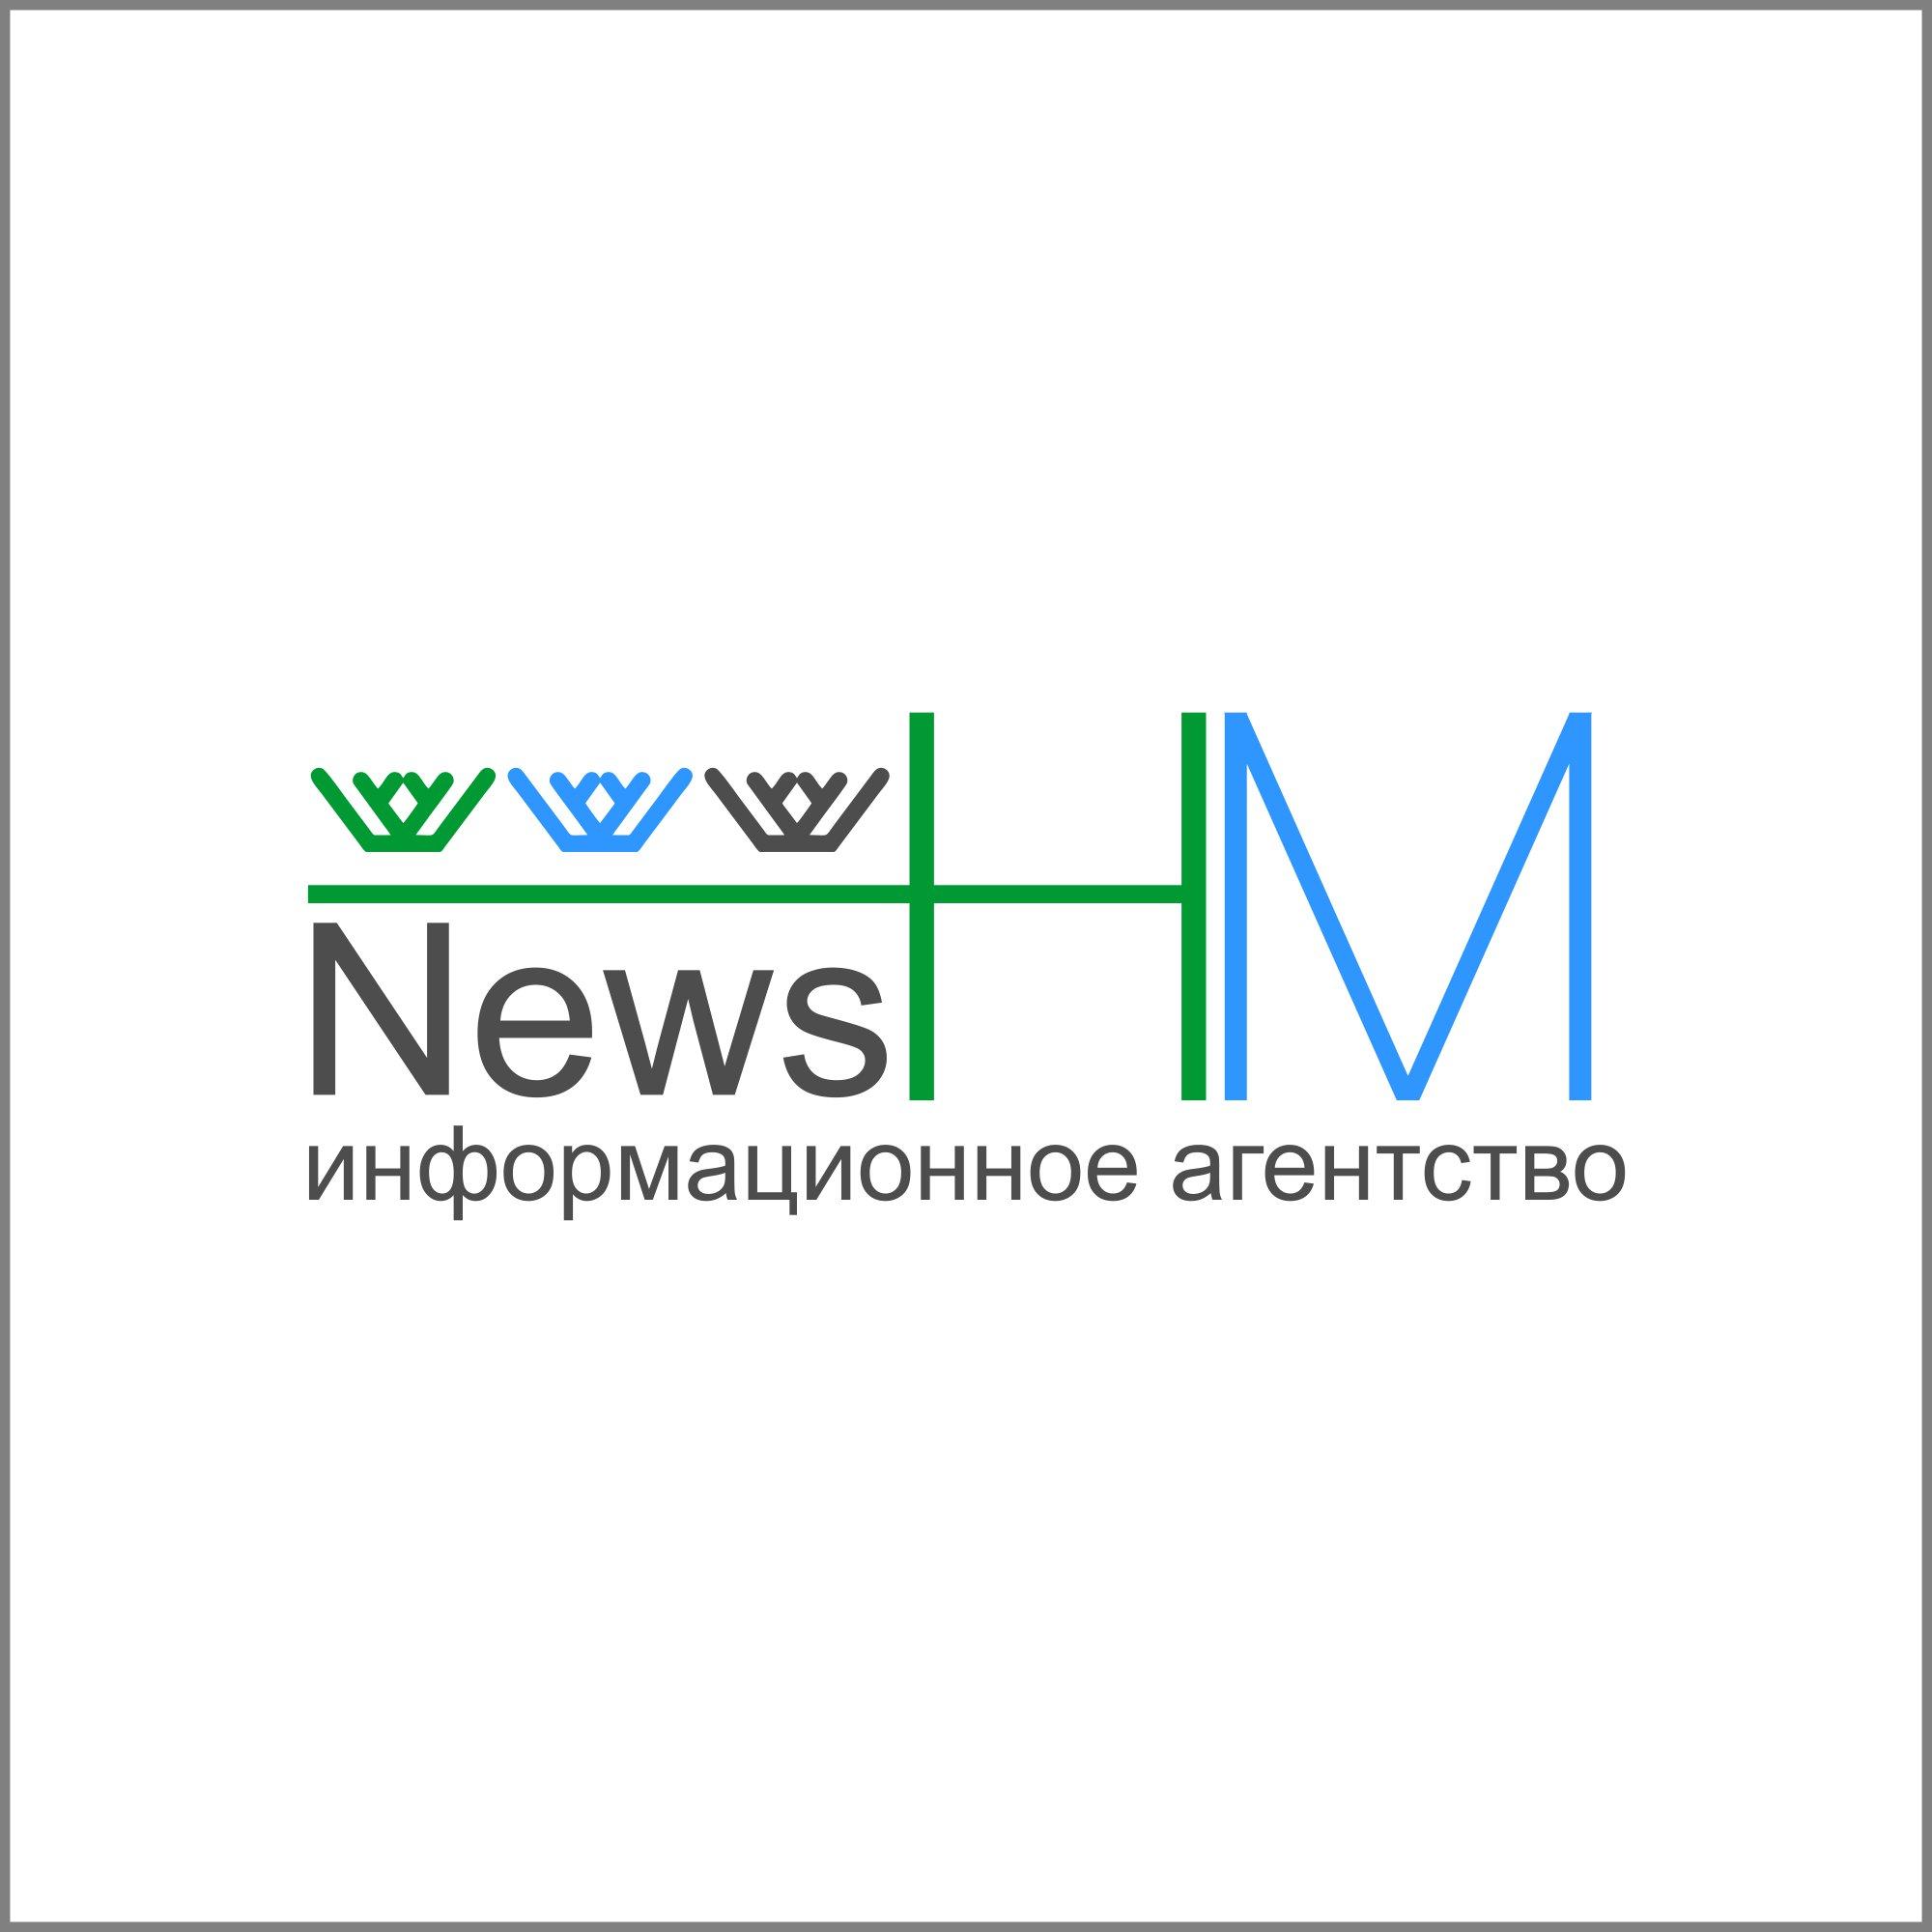 Логотип для информационного агентства фото f_8845aa7f77a33733.jpg